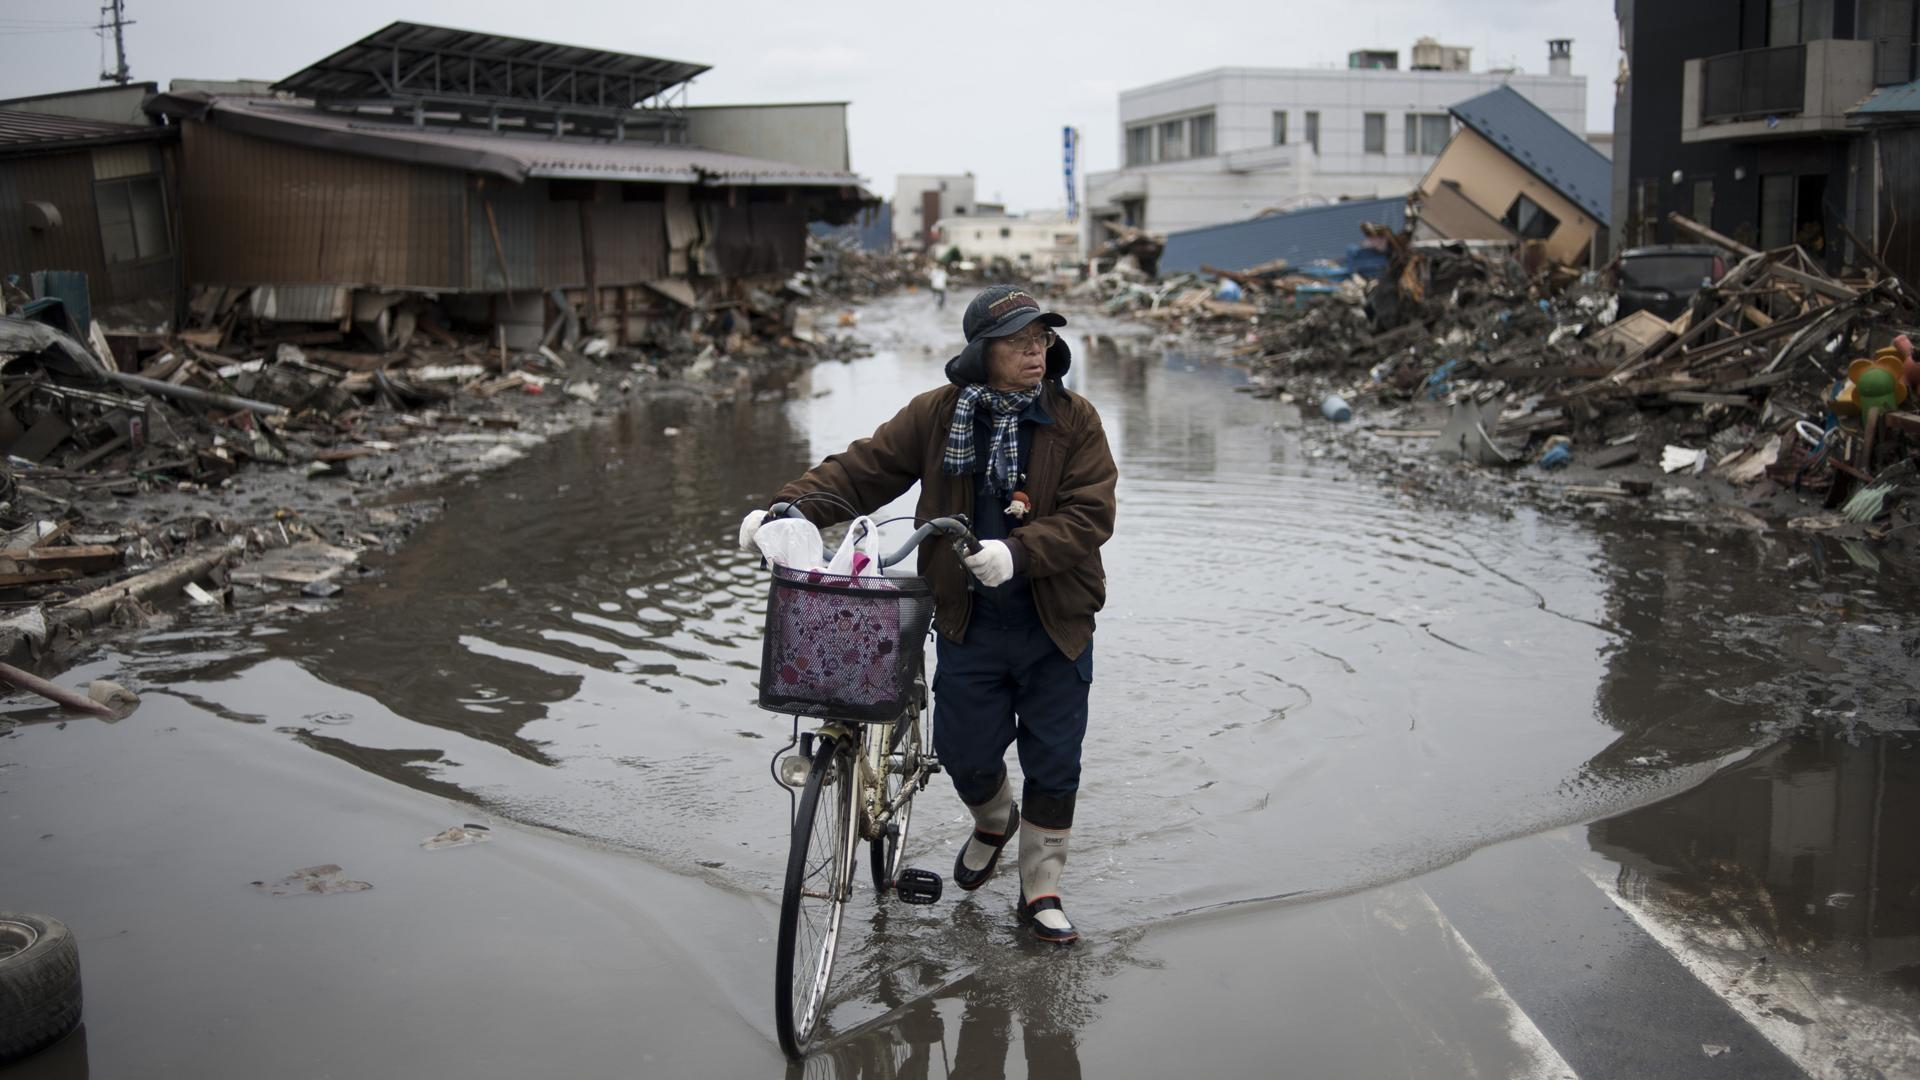 Japan's Killer Quake | NOVA | PBS